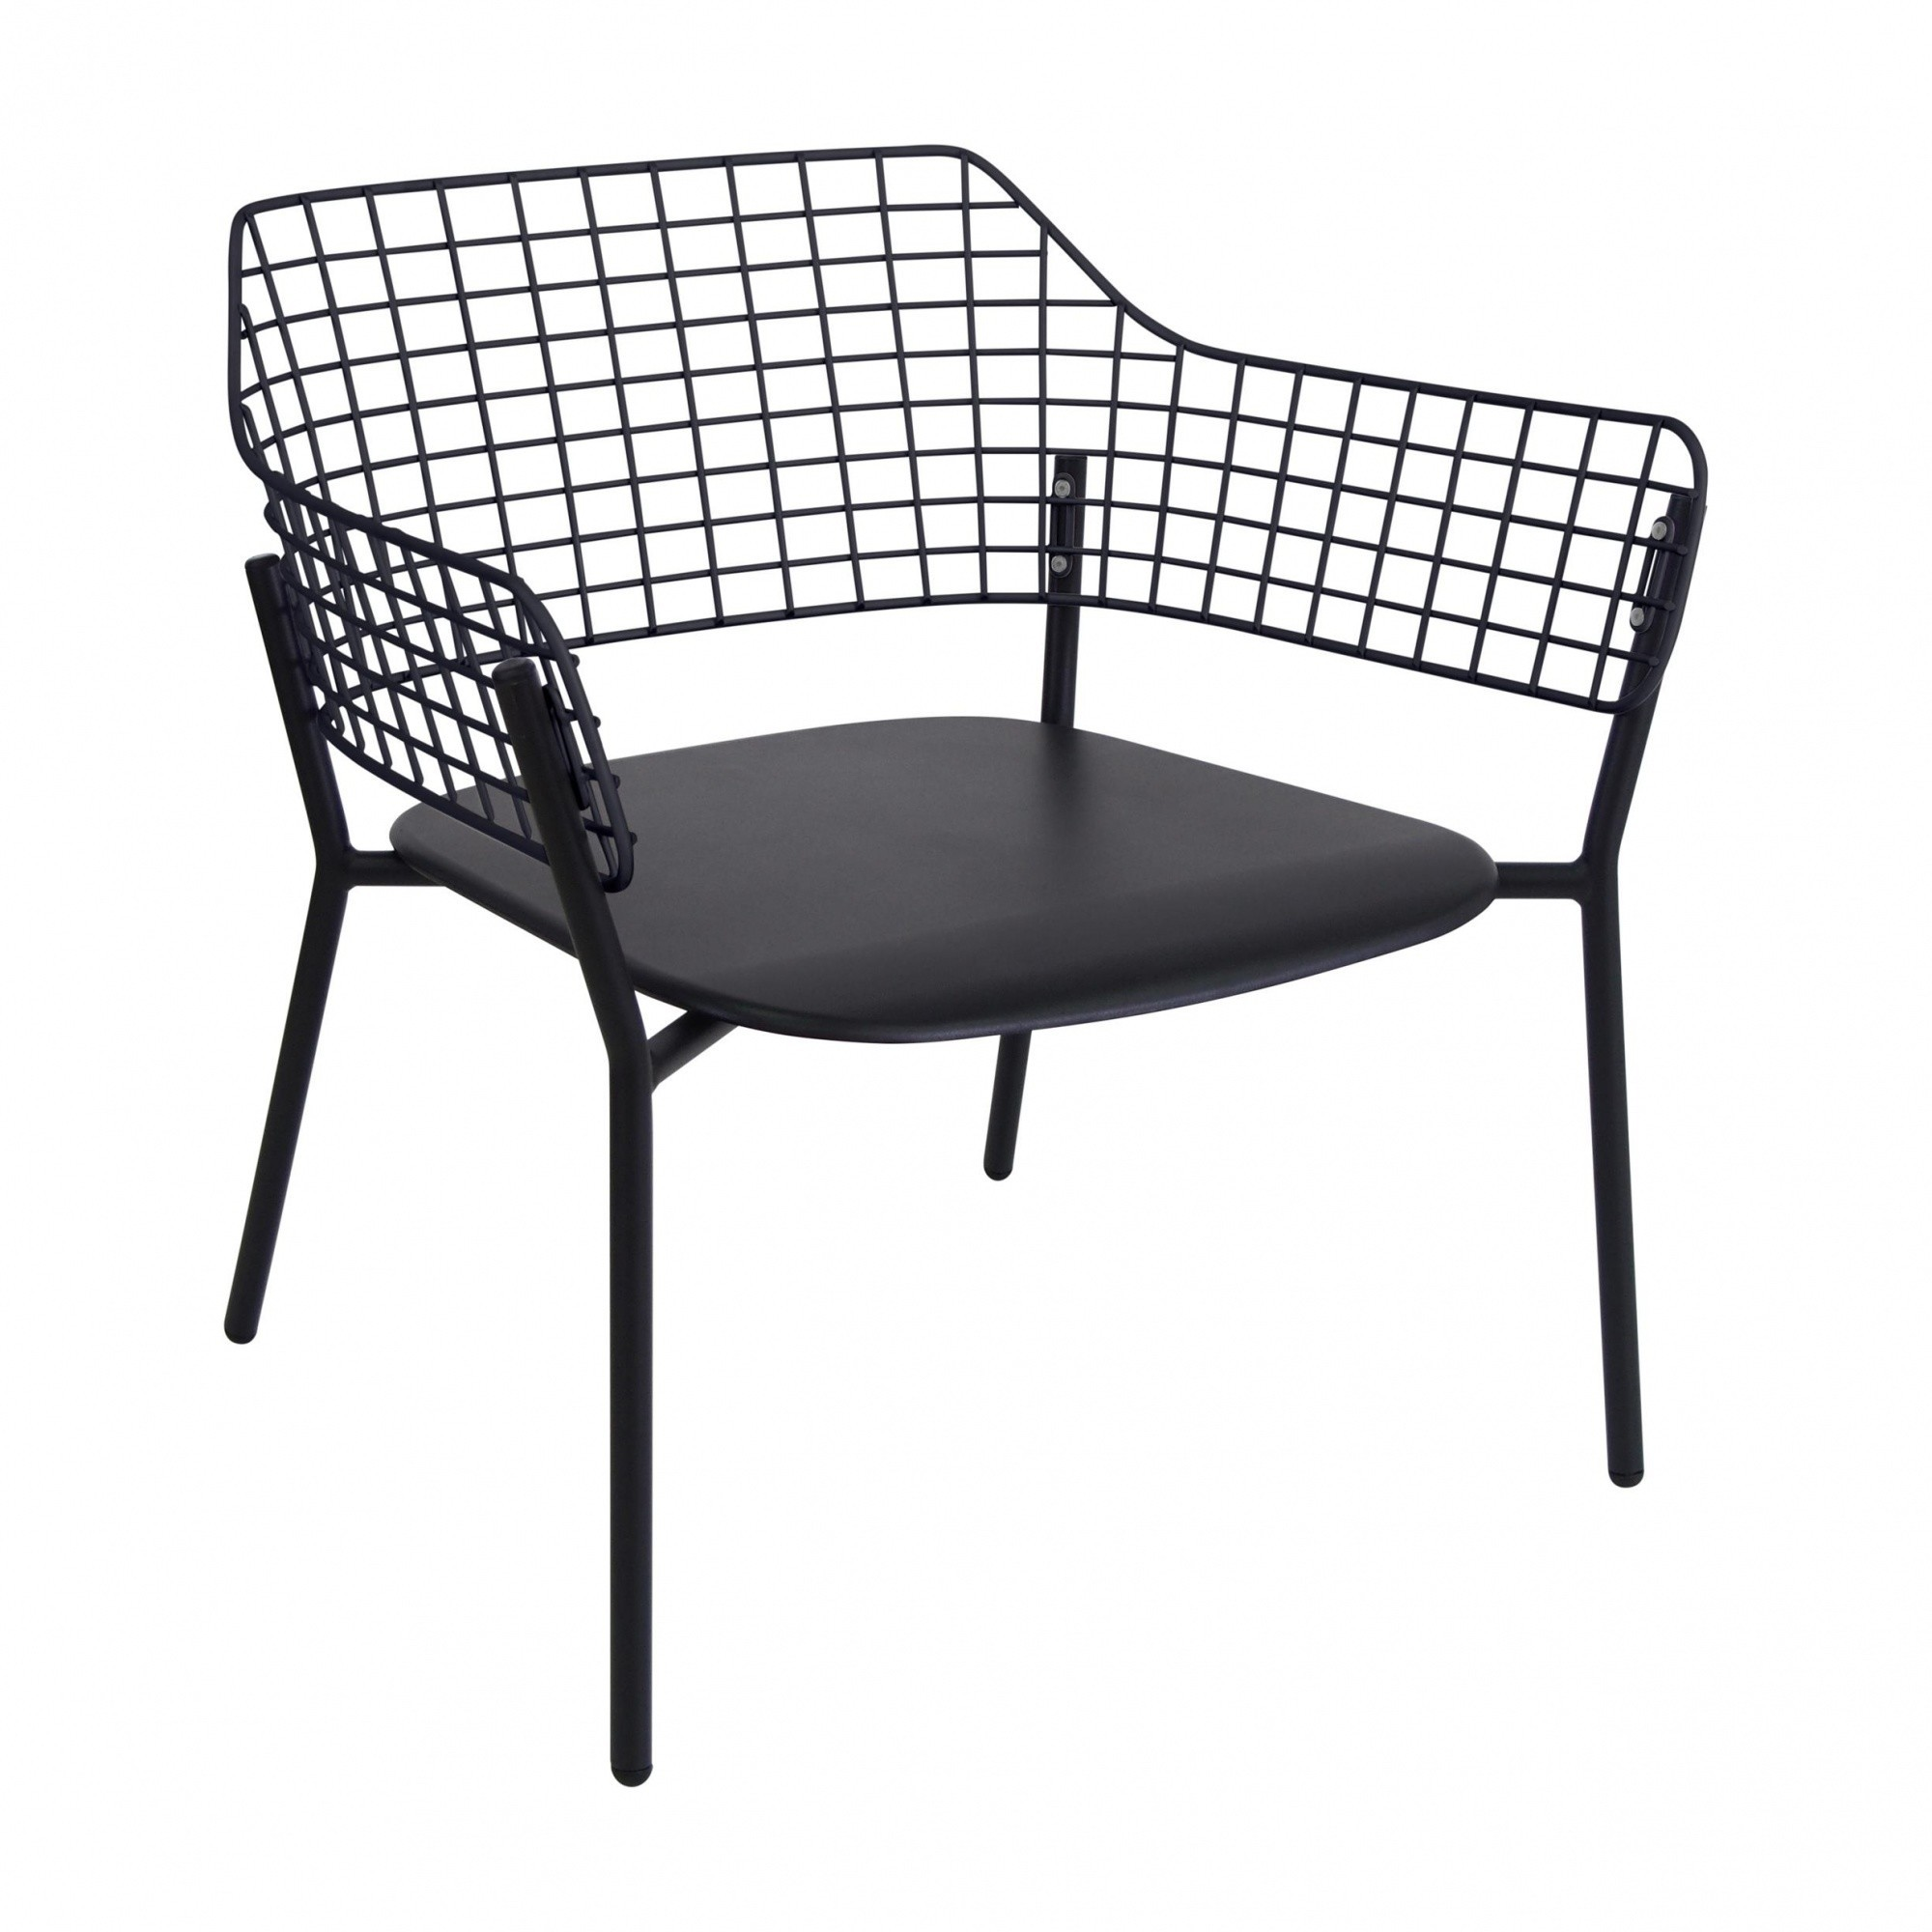 Lyze Garten-Loungesessel